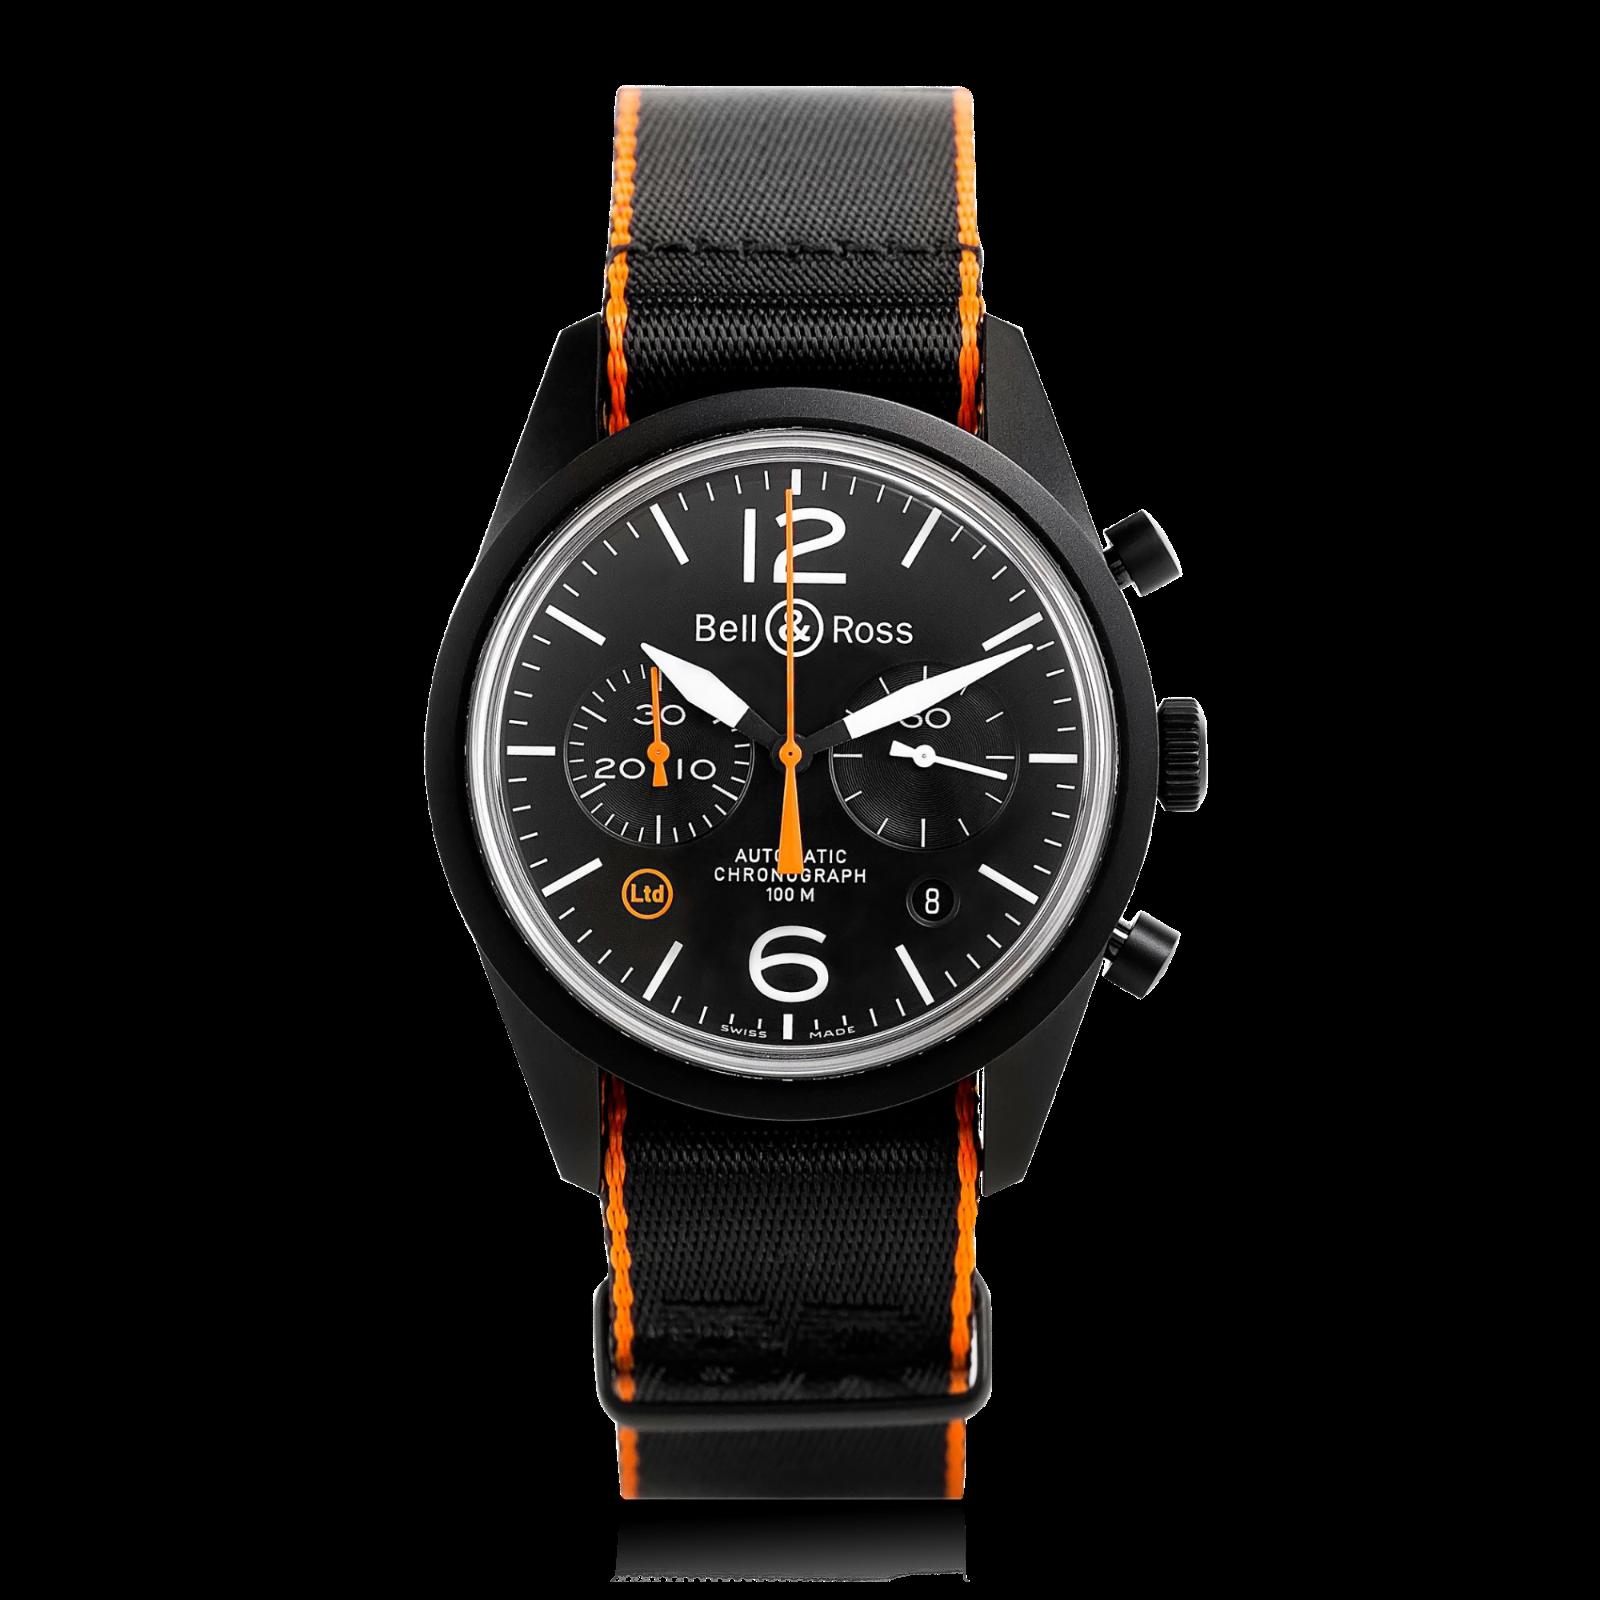 Bell & Ross BRV126-O-CA Men's Watch - watch picture 1